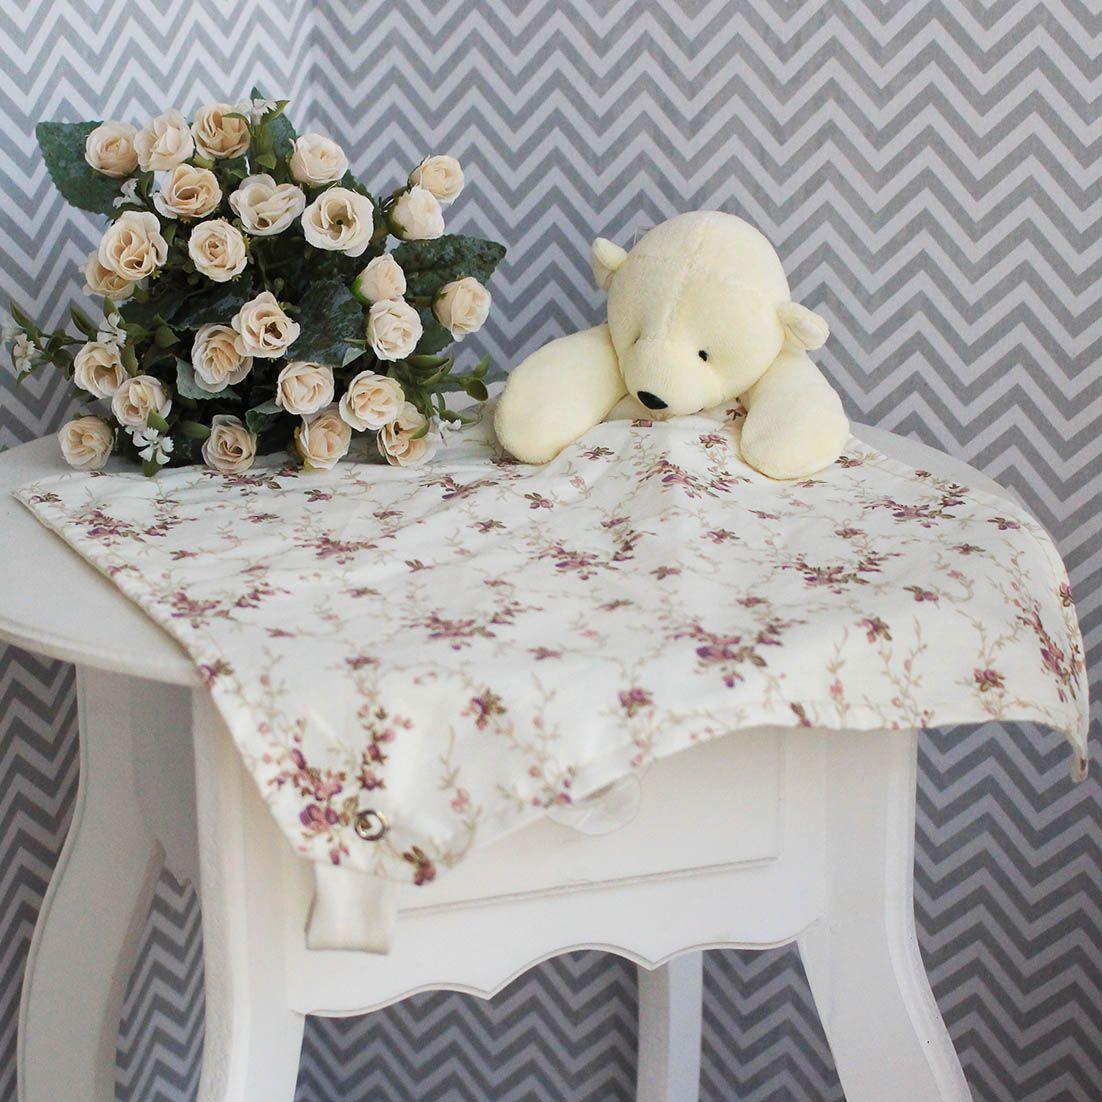 Naninha c/ Porta Chupeta - Ursa Floral Ferrugem